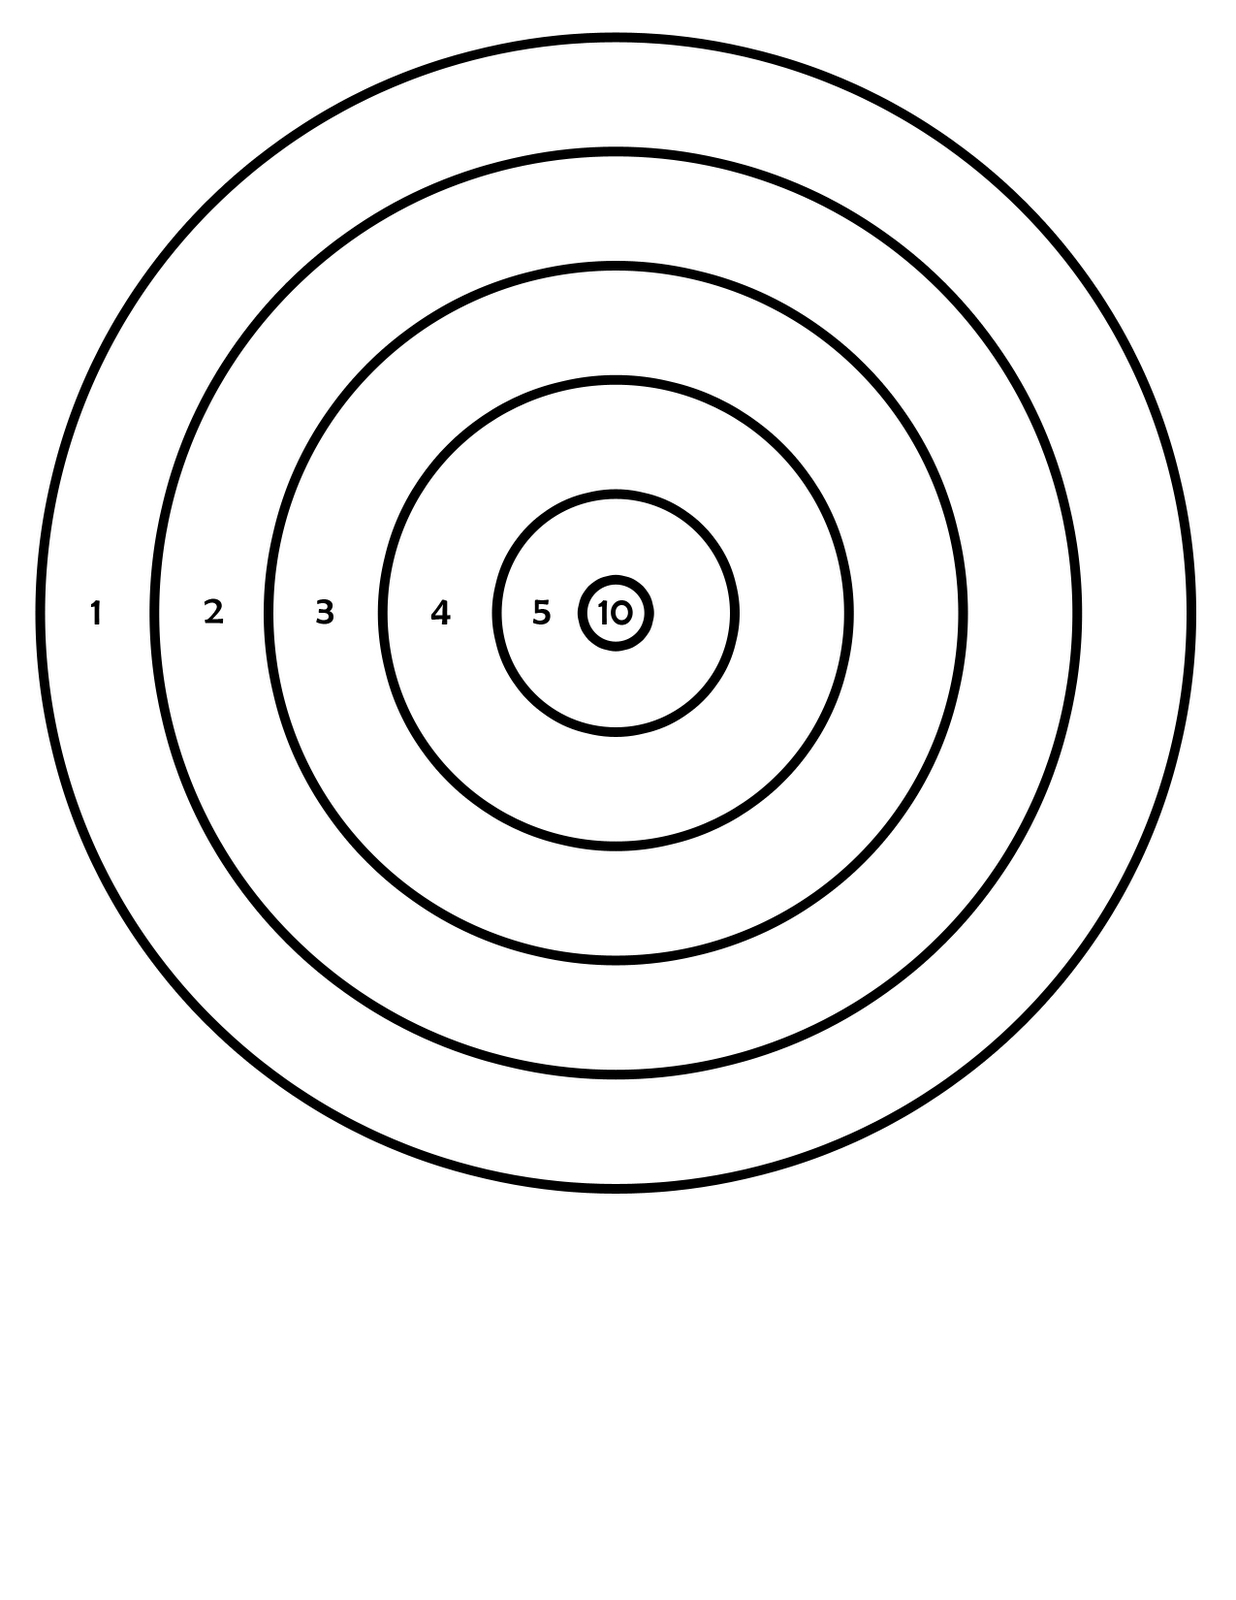 Printable Targets | 411Toys: Free Printable Airsoft Targets - Free Printable Shooting Targets